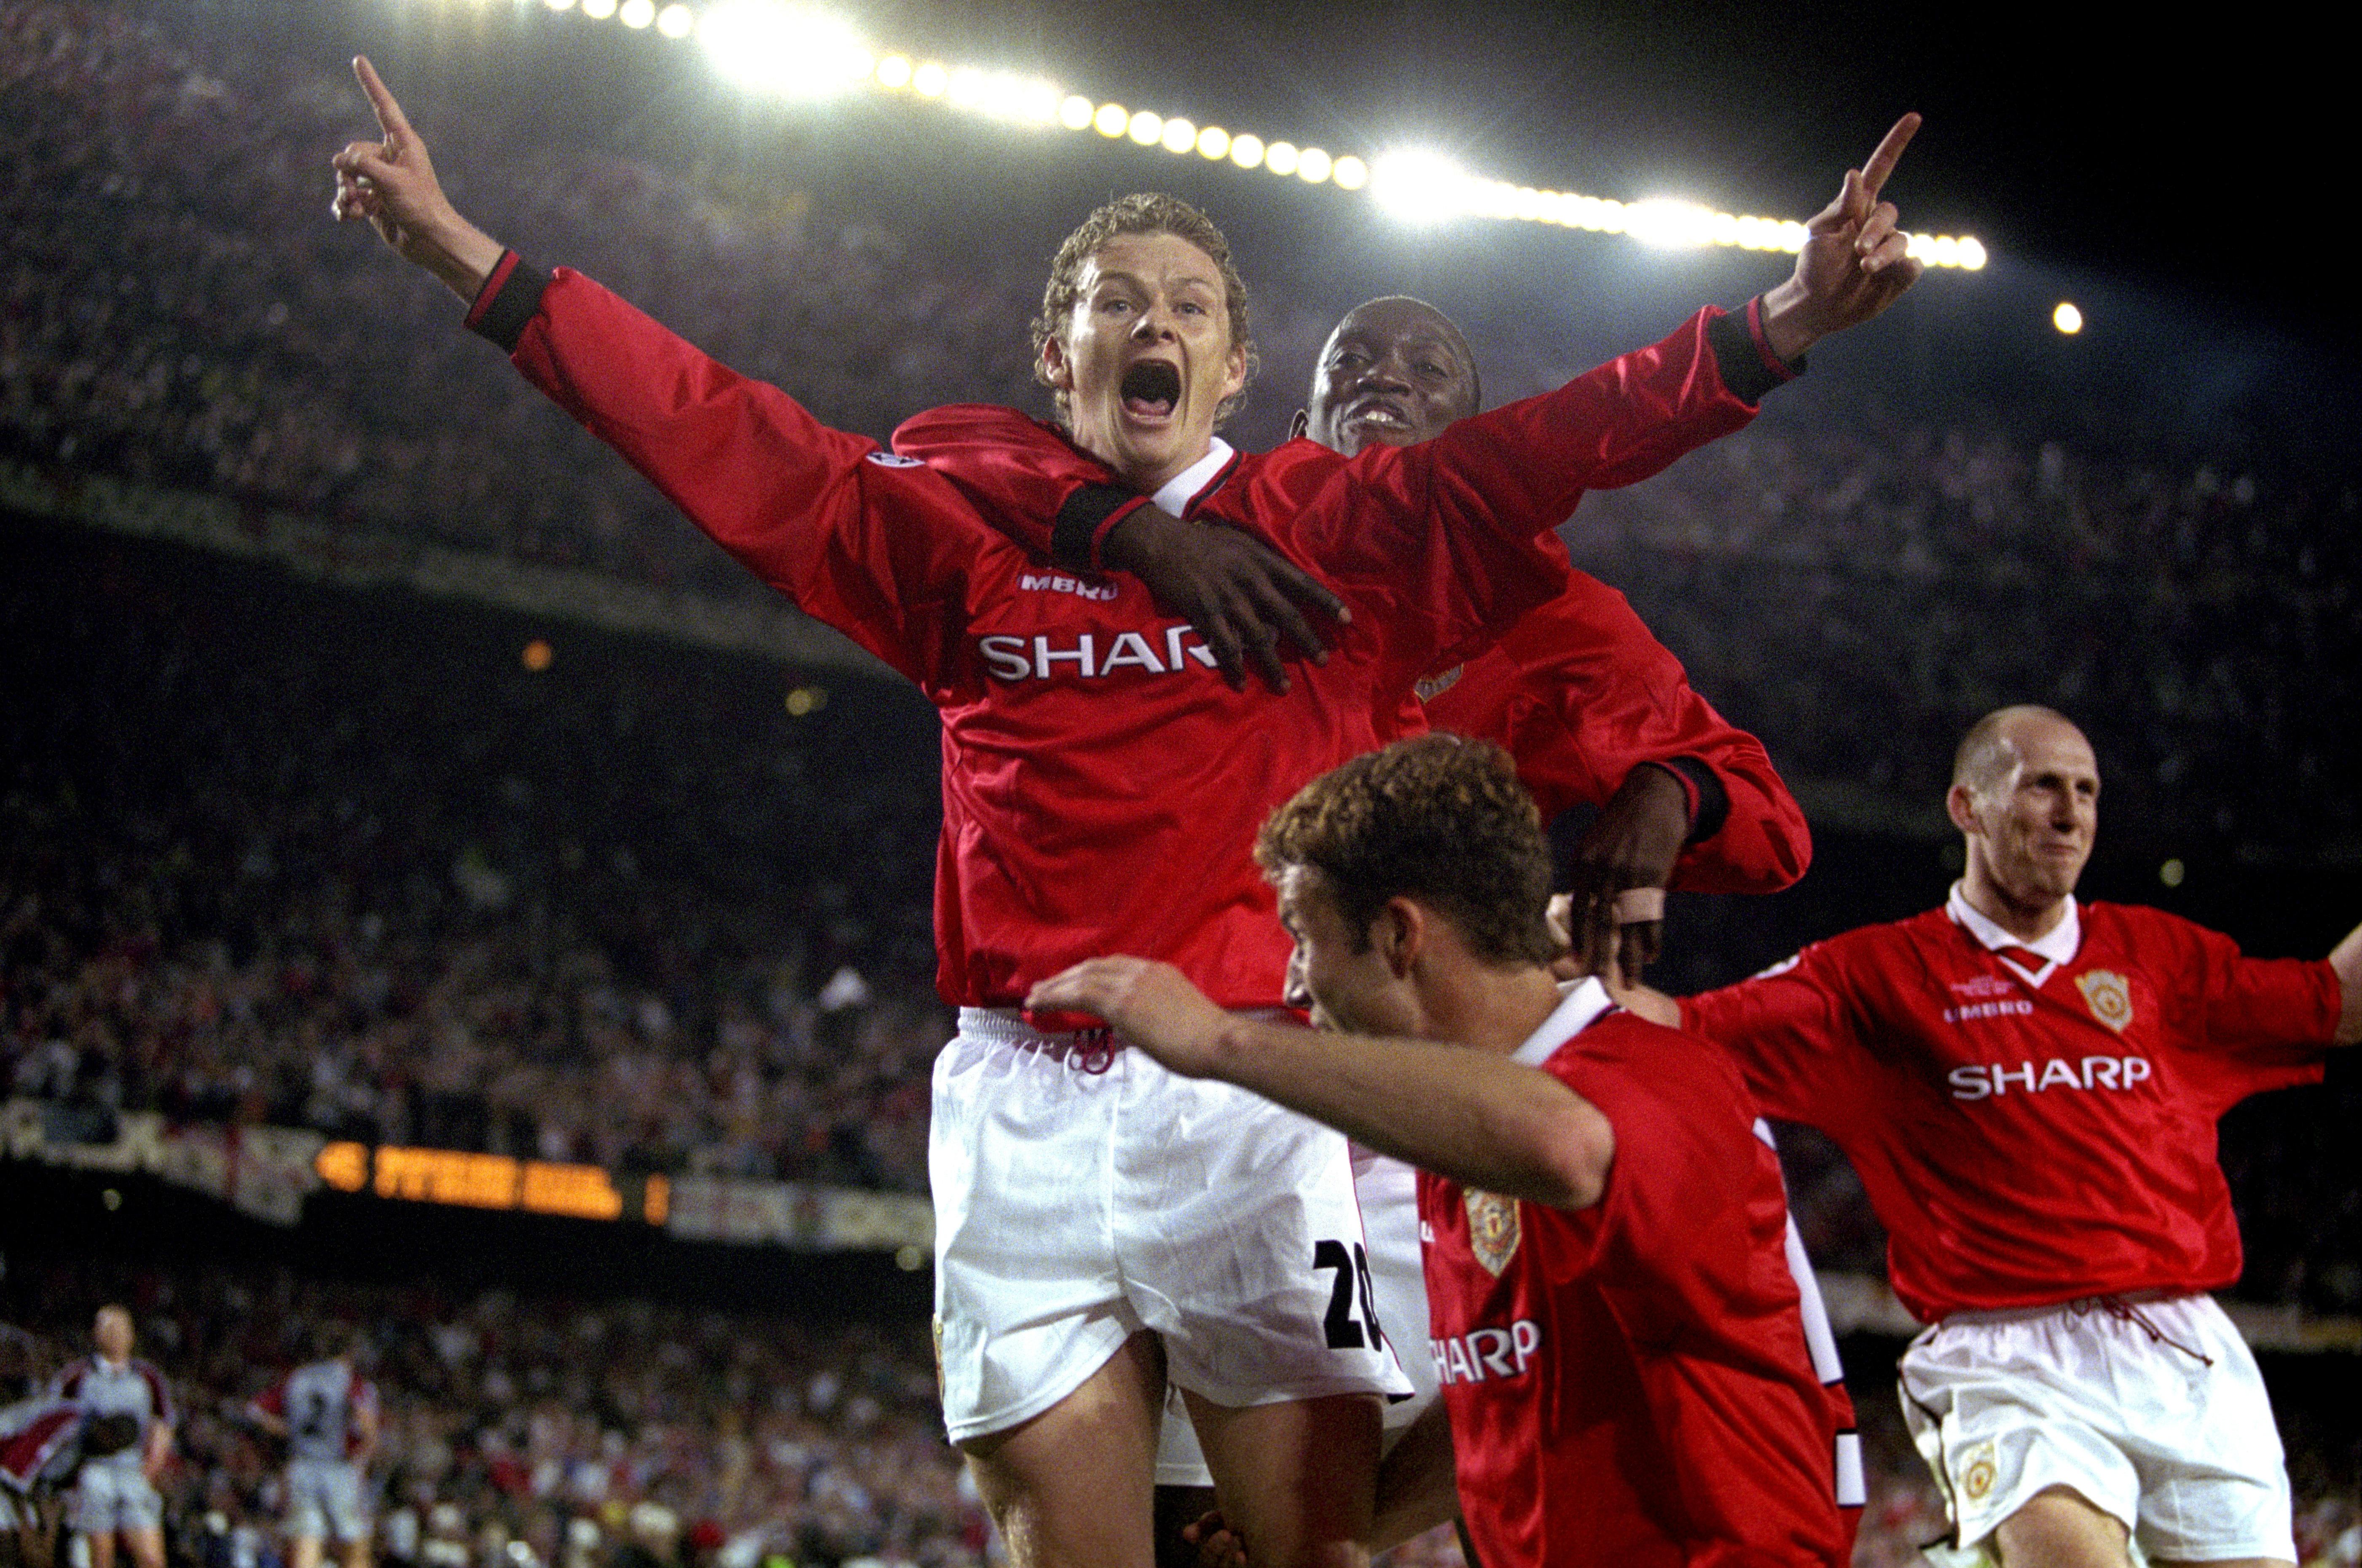 Solskjaer celebrates his infamous goal. Image: PA Images